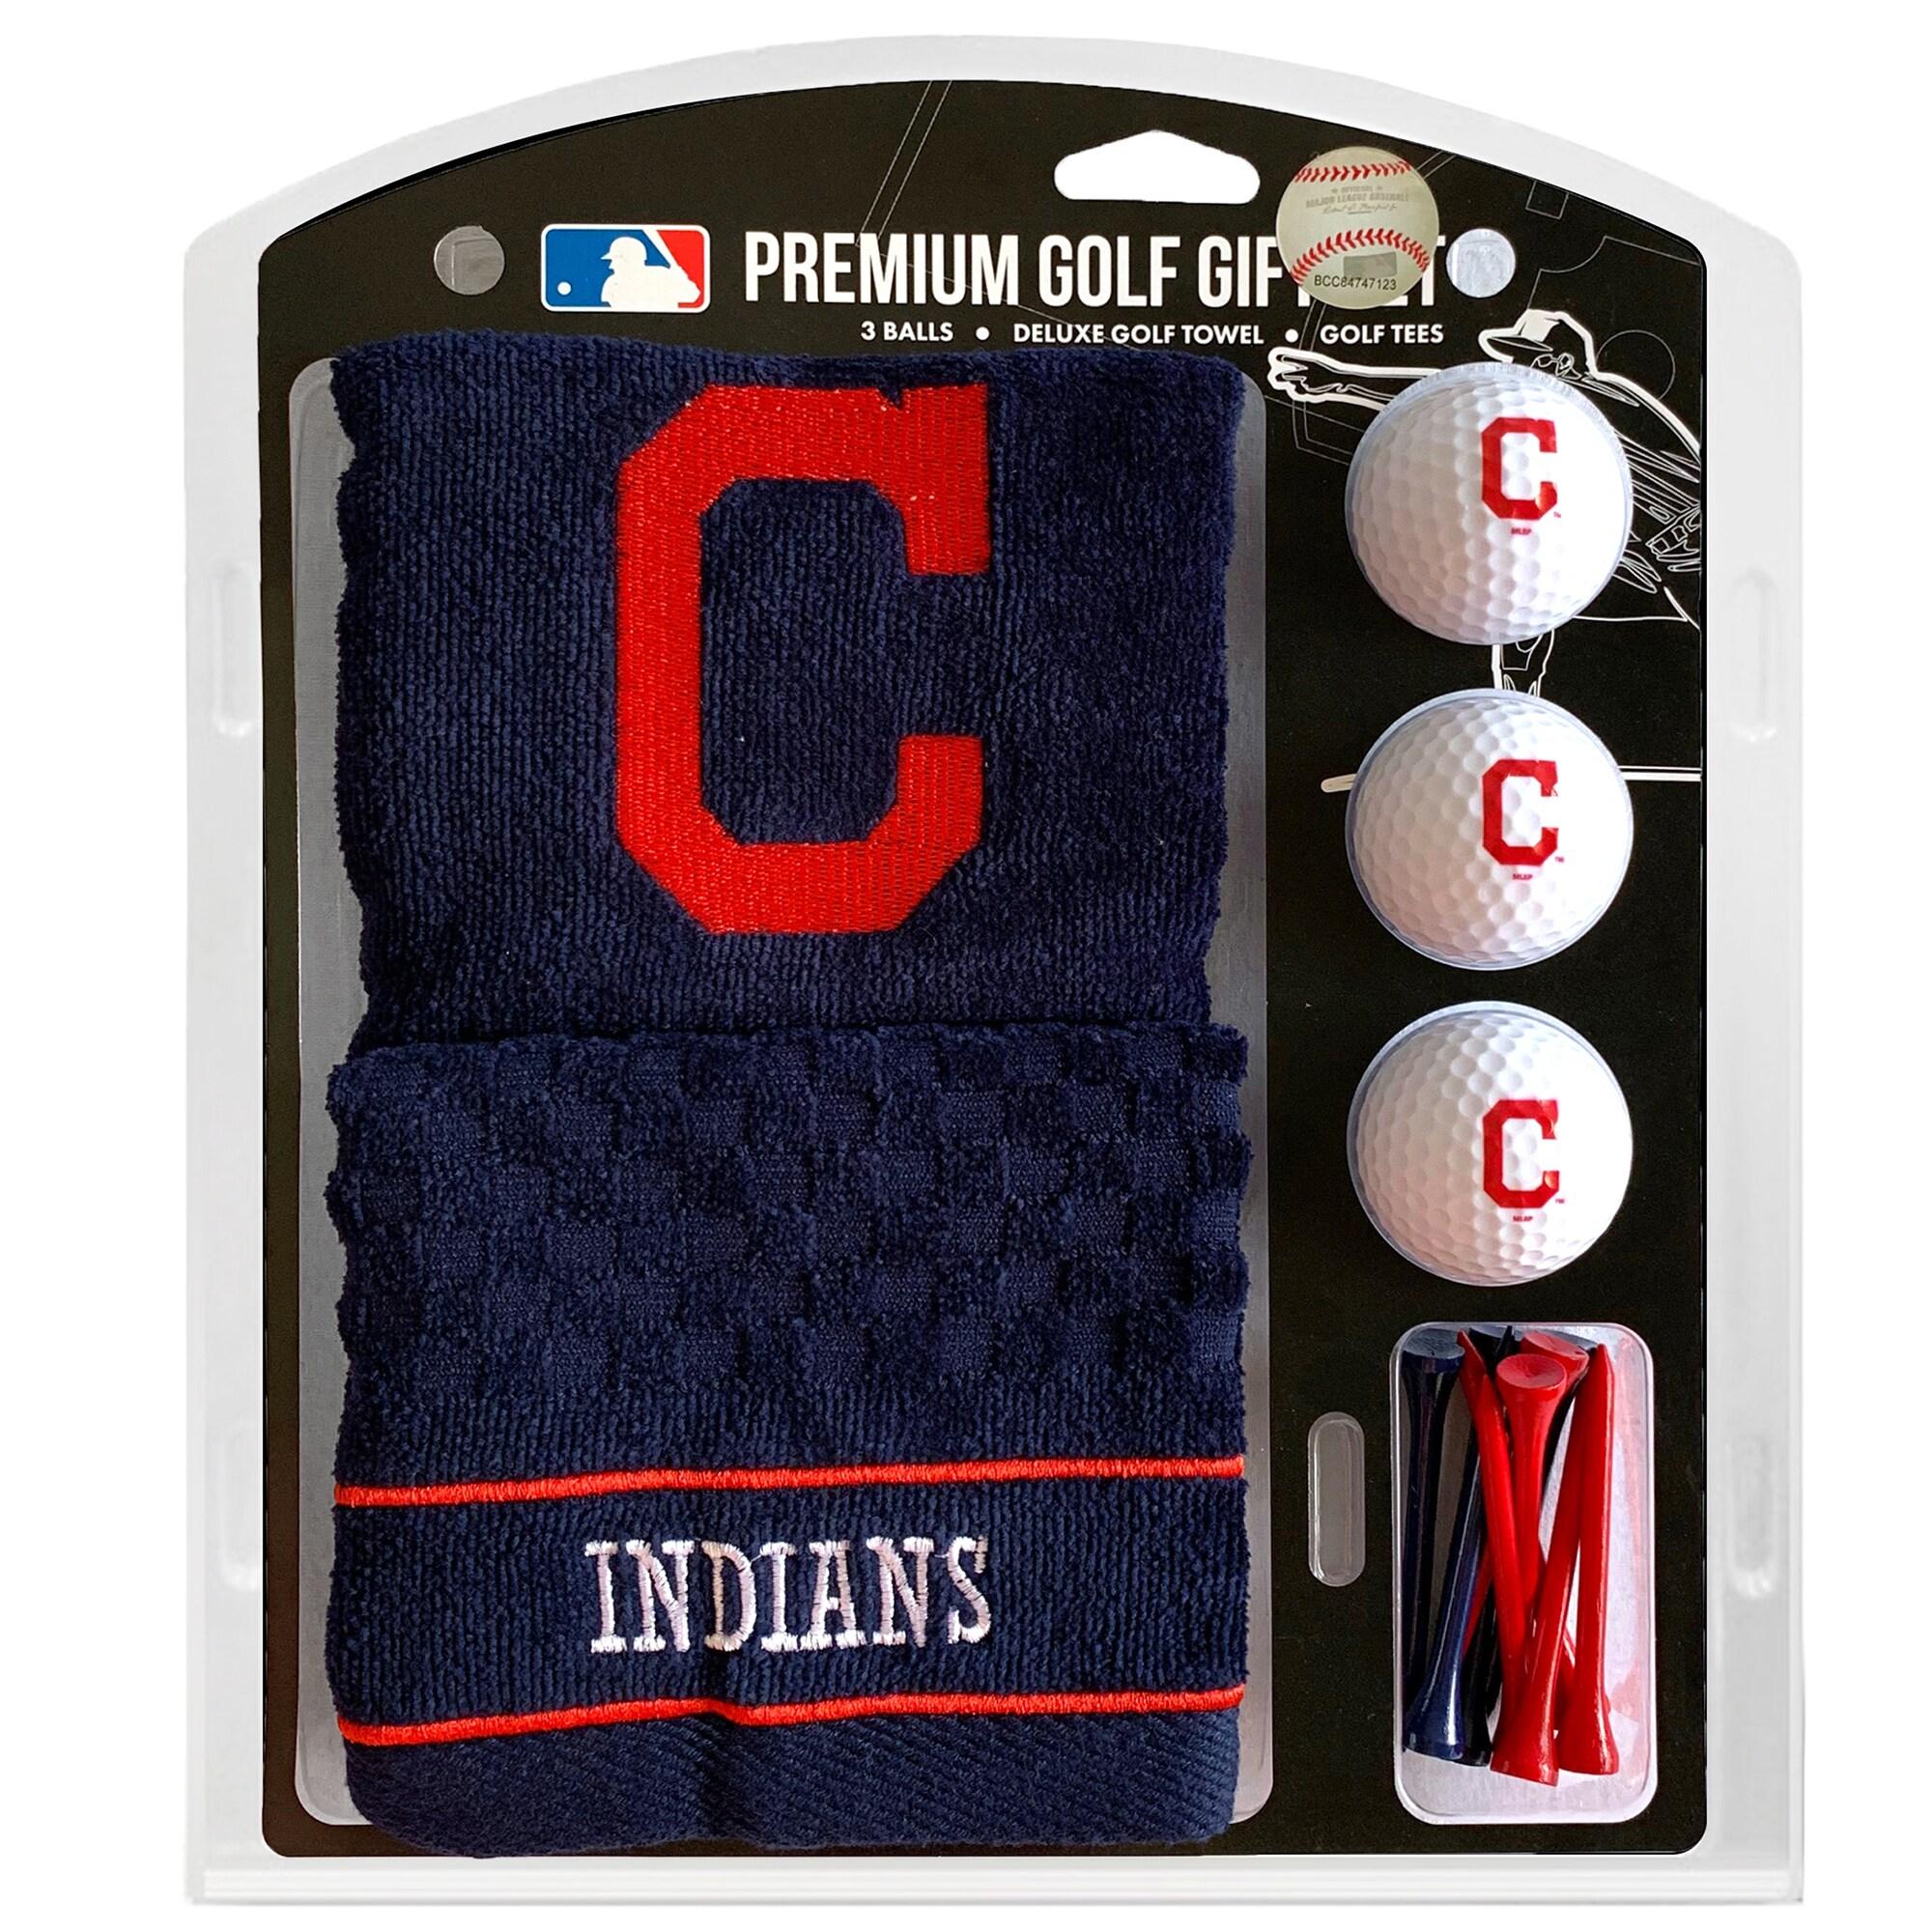 Cleveland Indians Embroidered Golf Gift Set